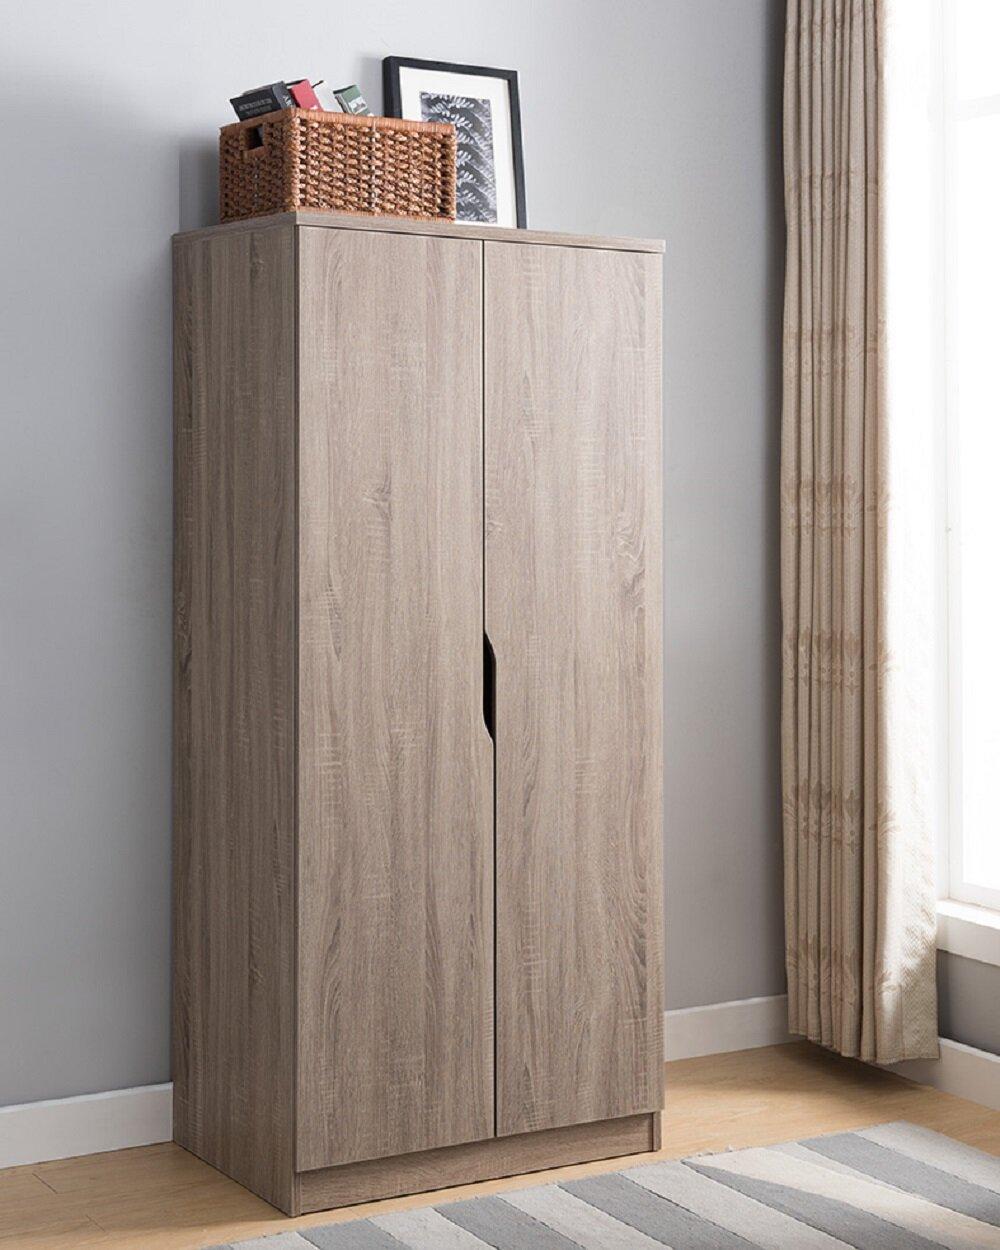 Laude Run Carin Wooden Storage